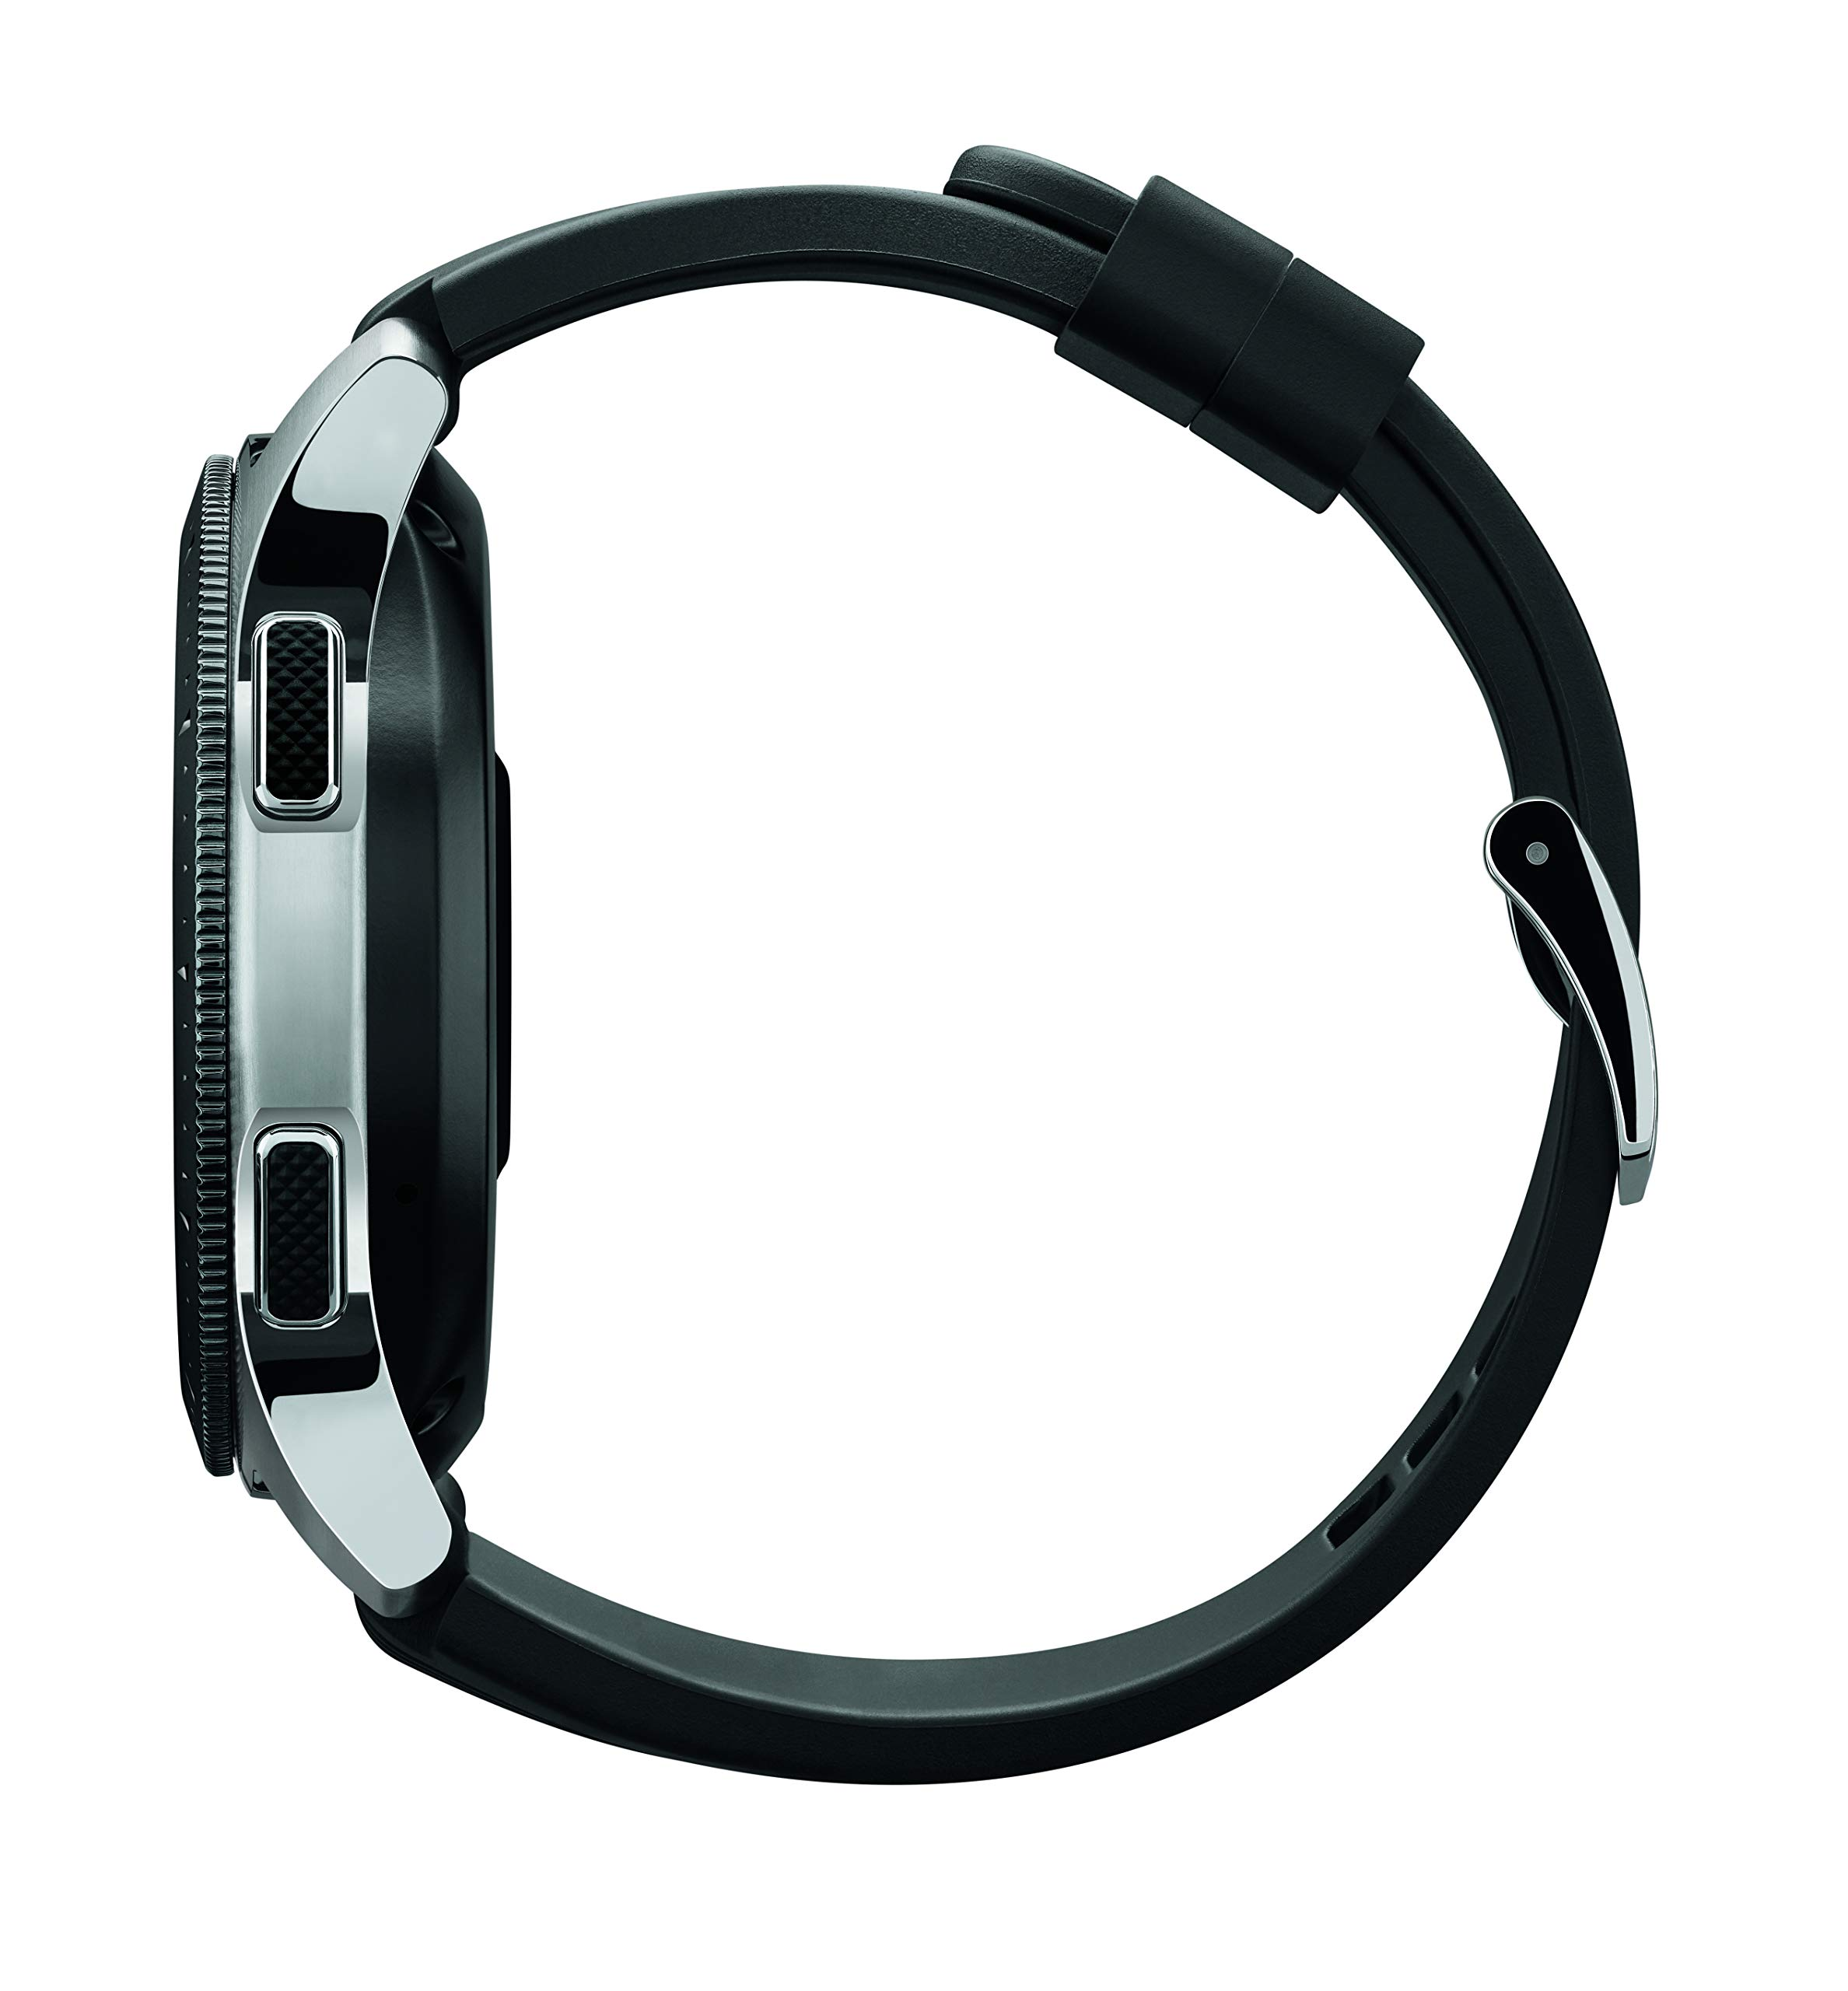 Samsung Galaxy Smartwatch (46mm) Silver (Bluetooth), SM-R800NZSAXAR - US Version with Warranty by Samsung (Image #3)